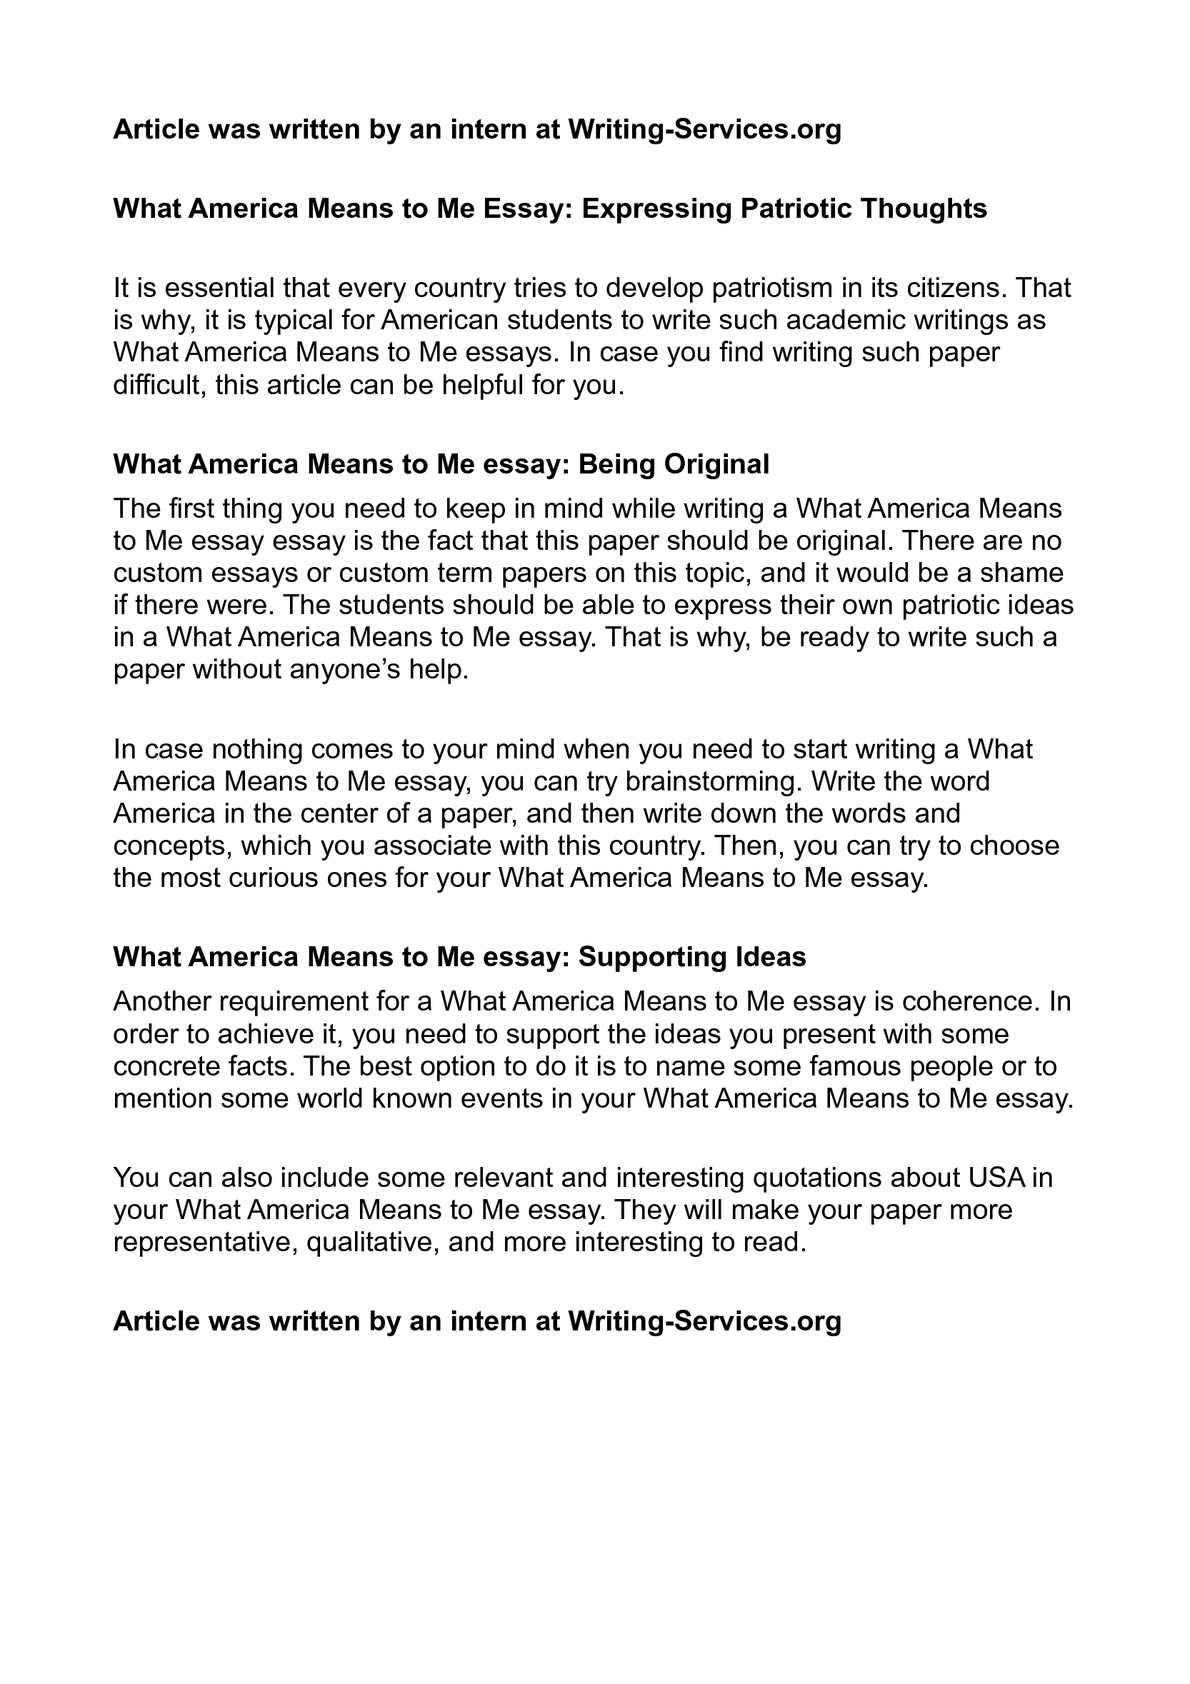 007 My Name Essay P1 Stunning Conclusion Esperanza Full